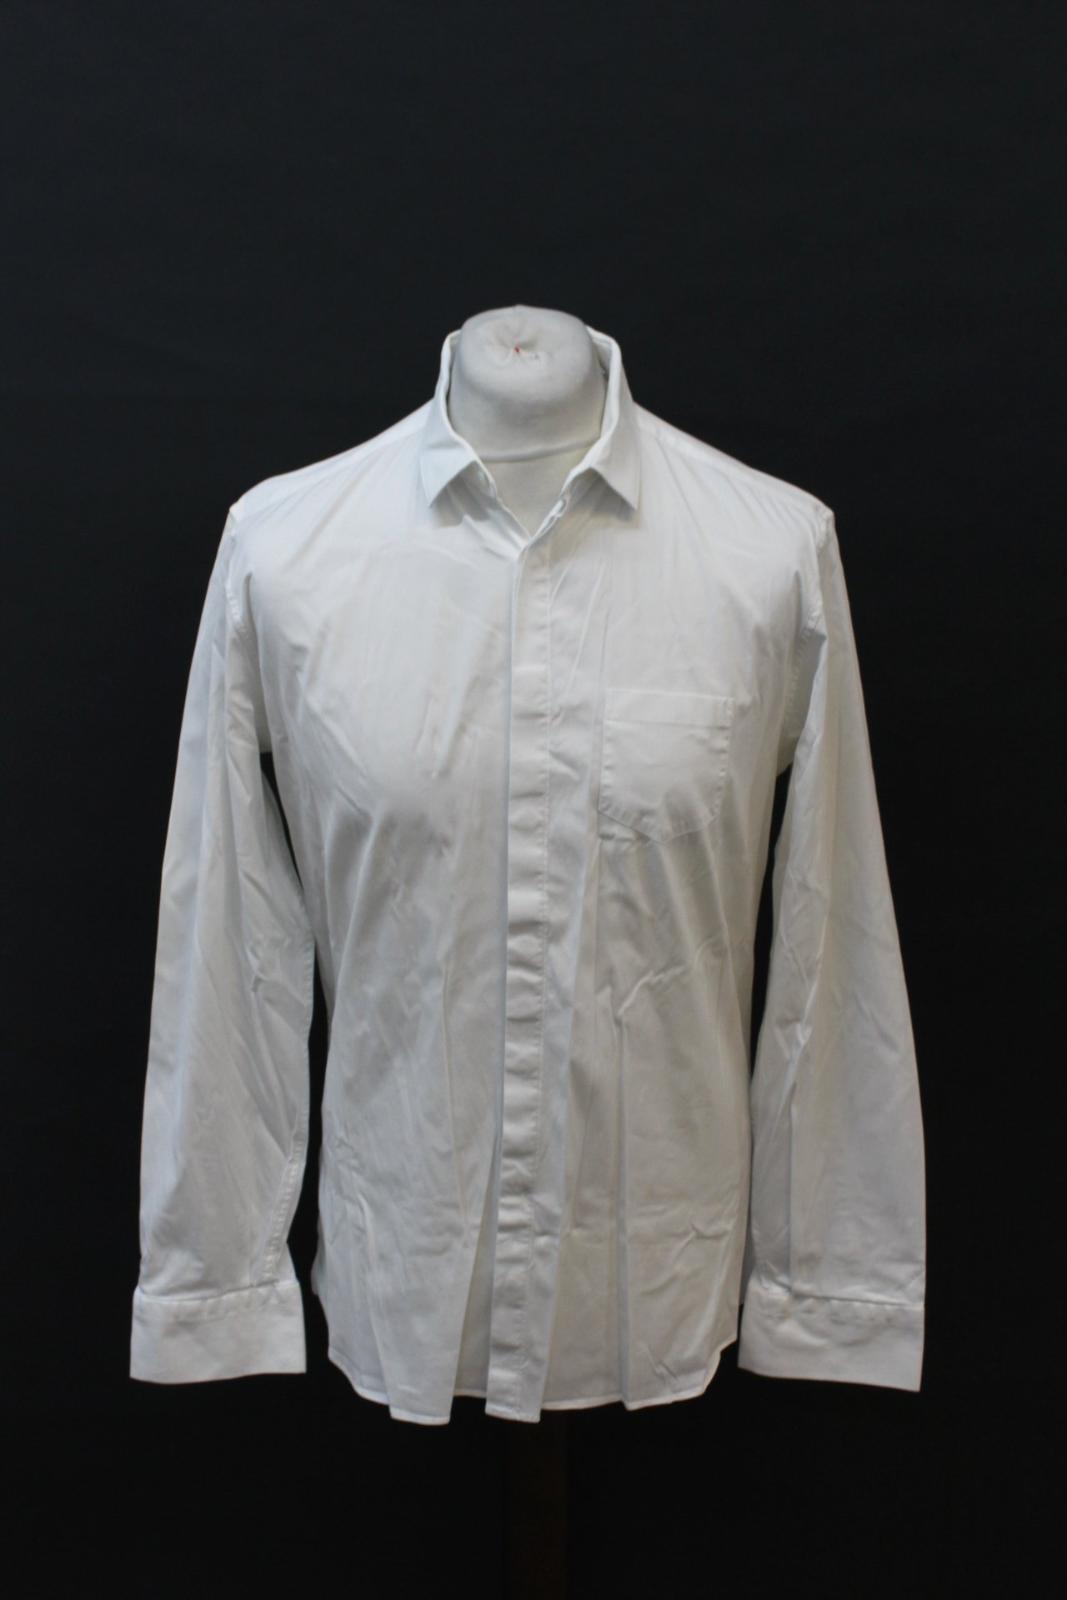 NEIL-BARRETT-Men-039-s-White-Cotton-Blend-Slim-Fit-Formal-Shirt-Collar-16-5-034-42cm miniatura 11